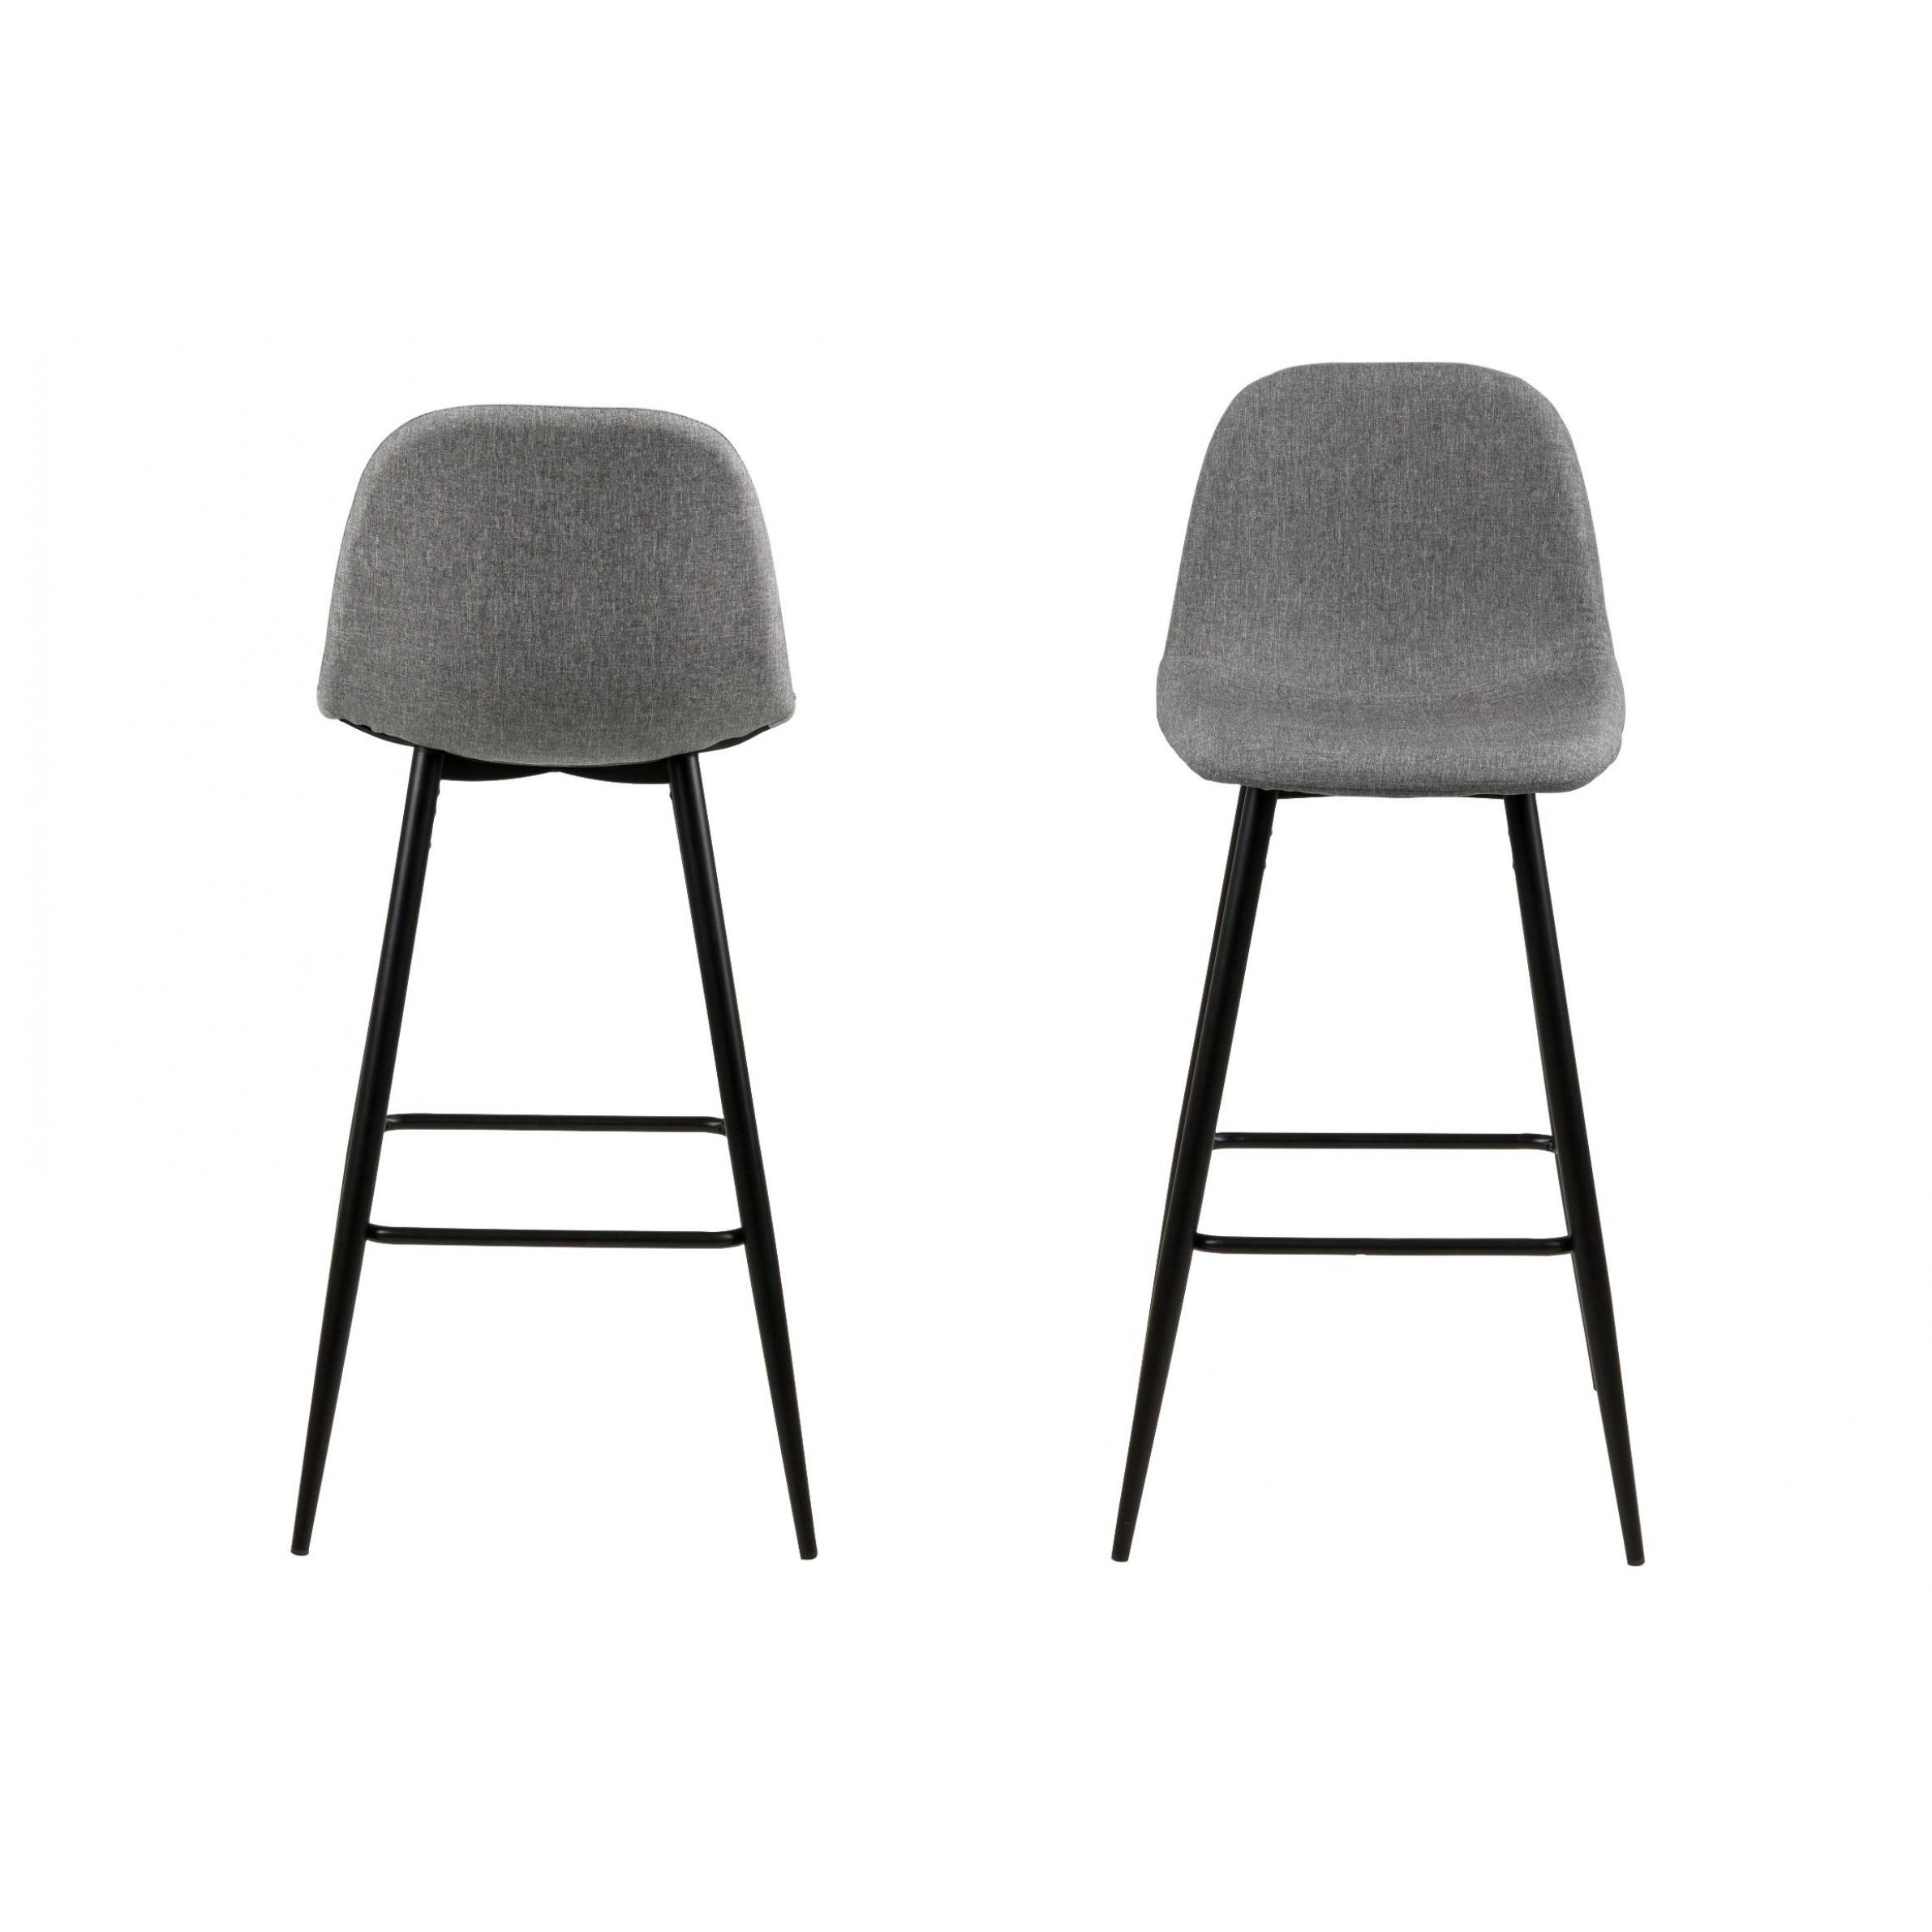 Set of 2 Bar Stools Wendy | Grey / Metal